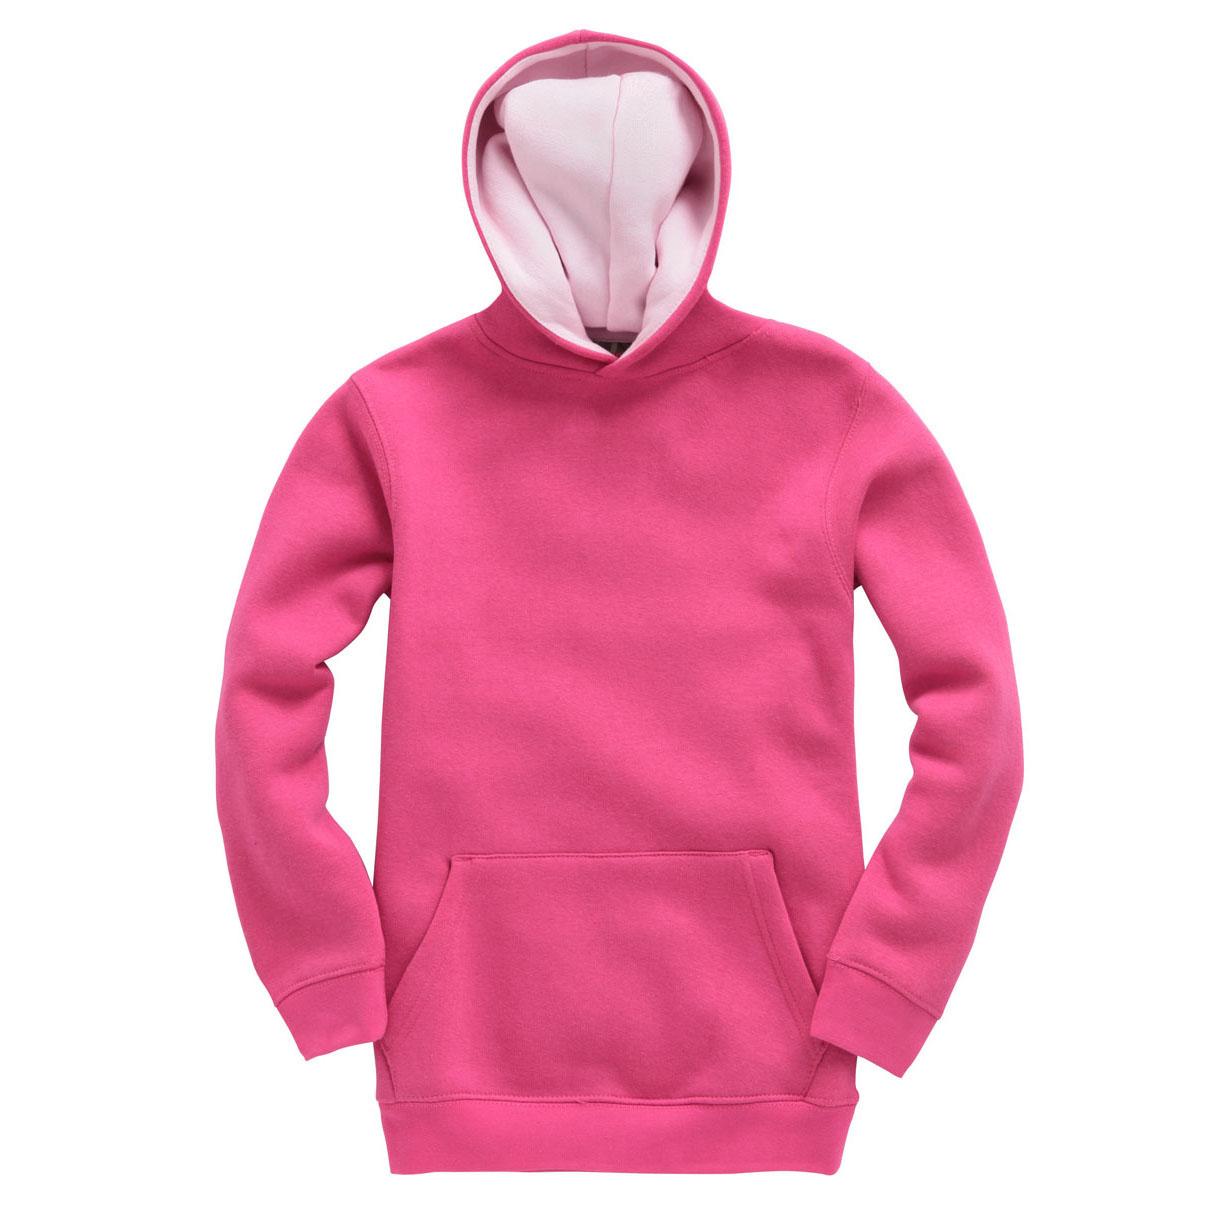 Fuschia / Baby Pink